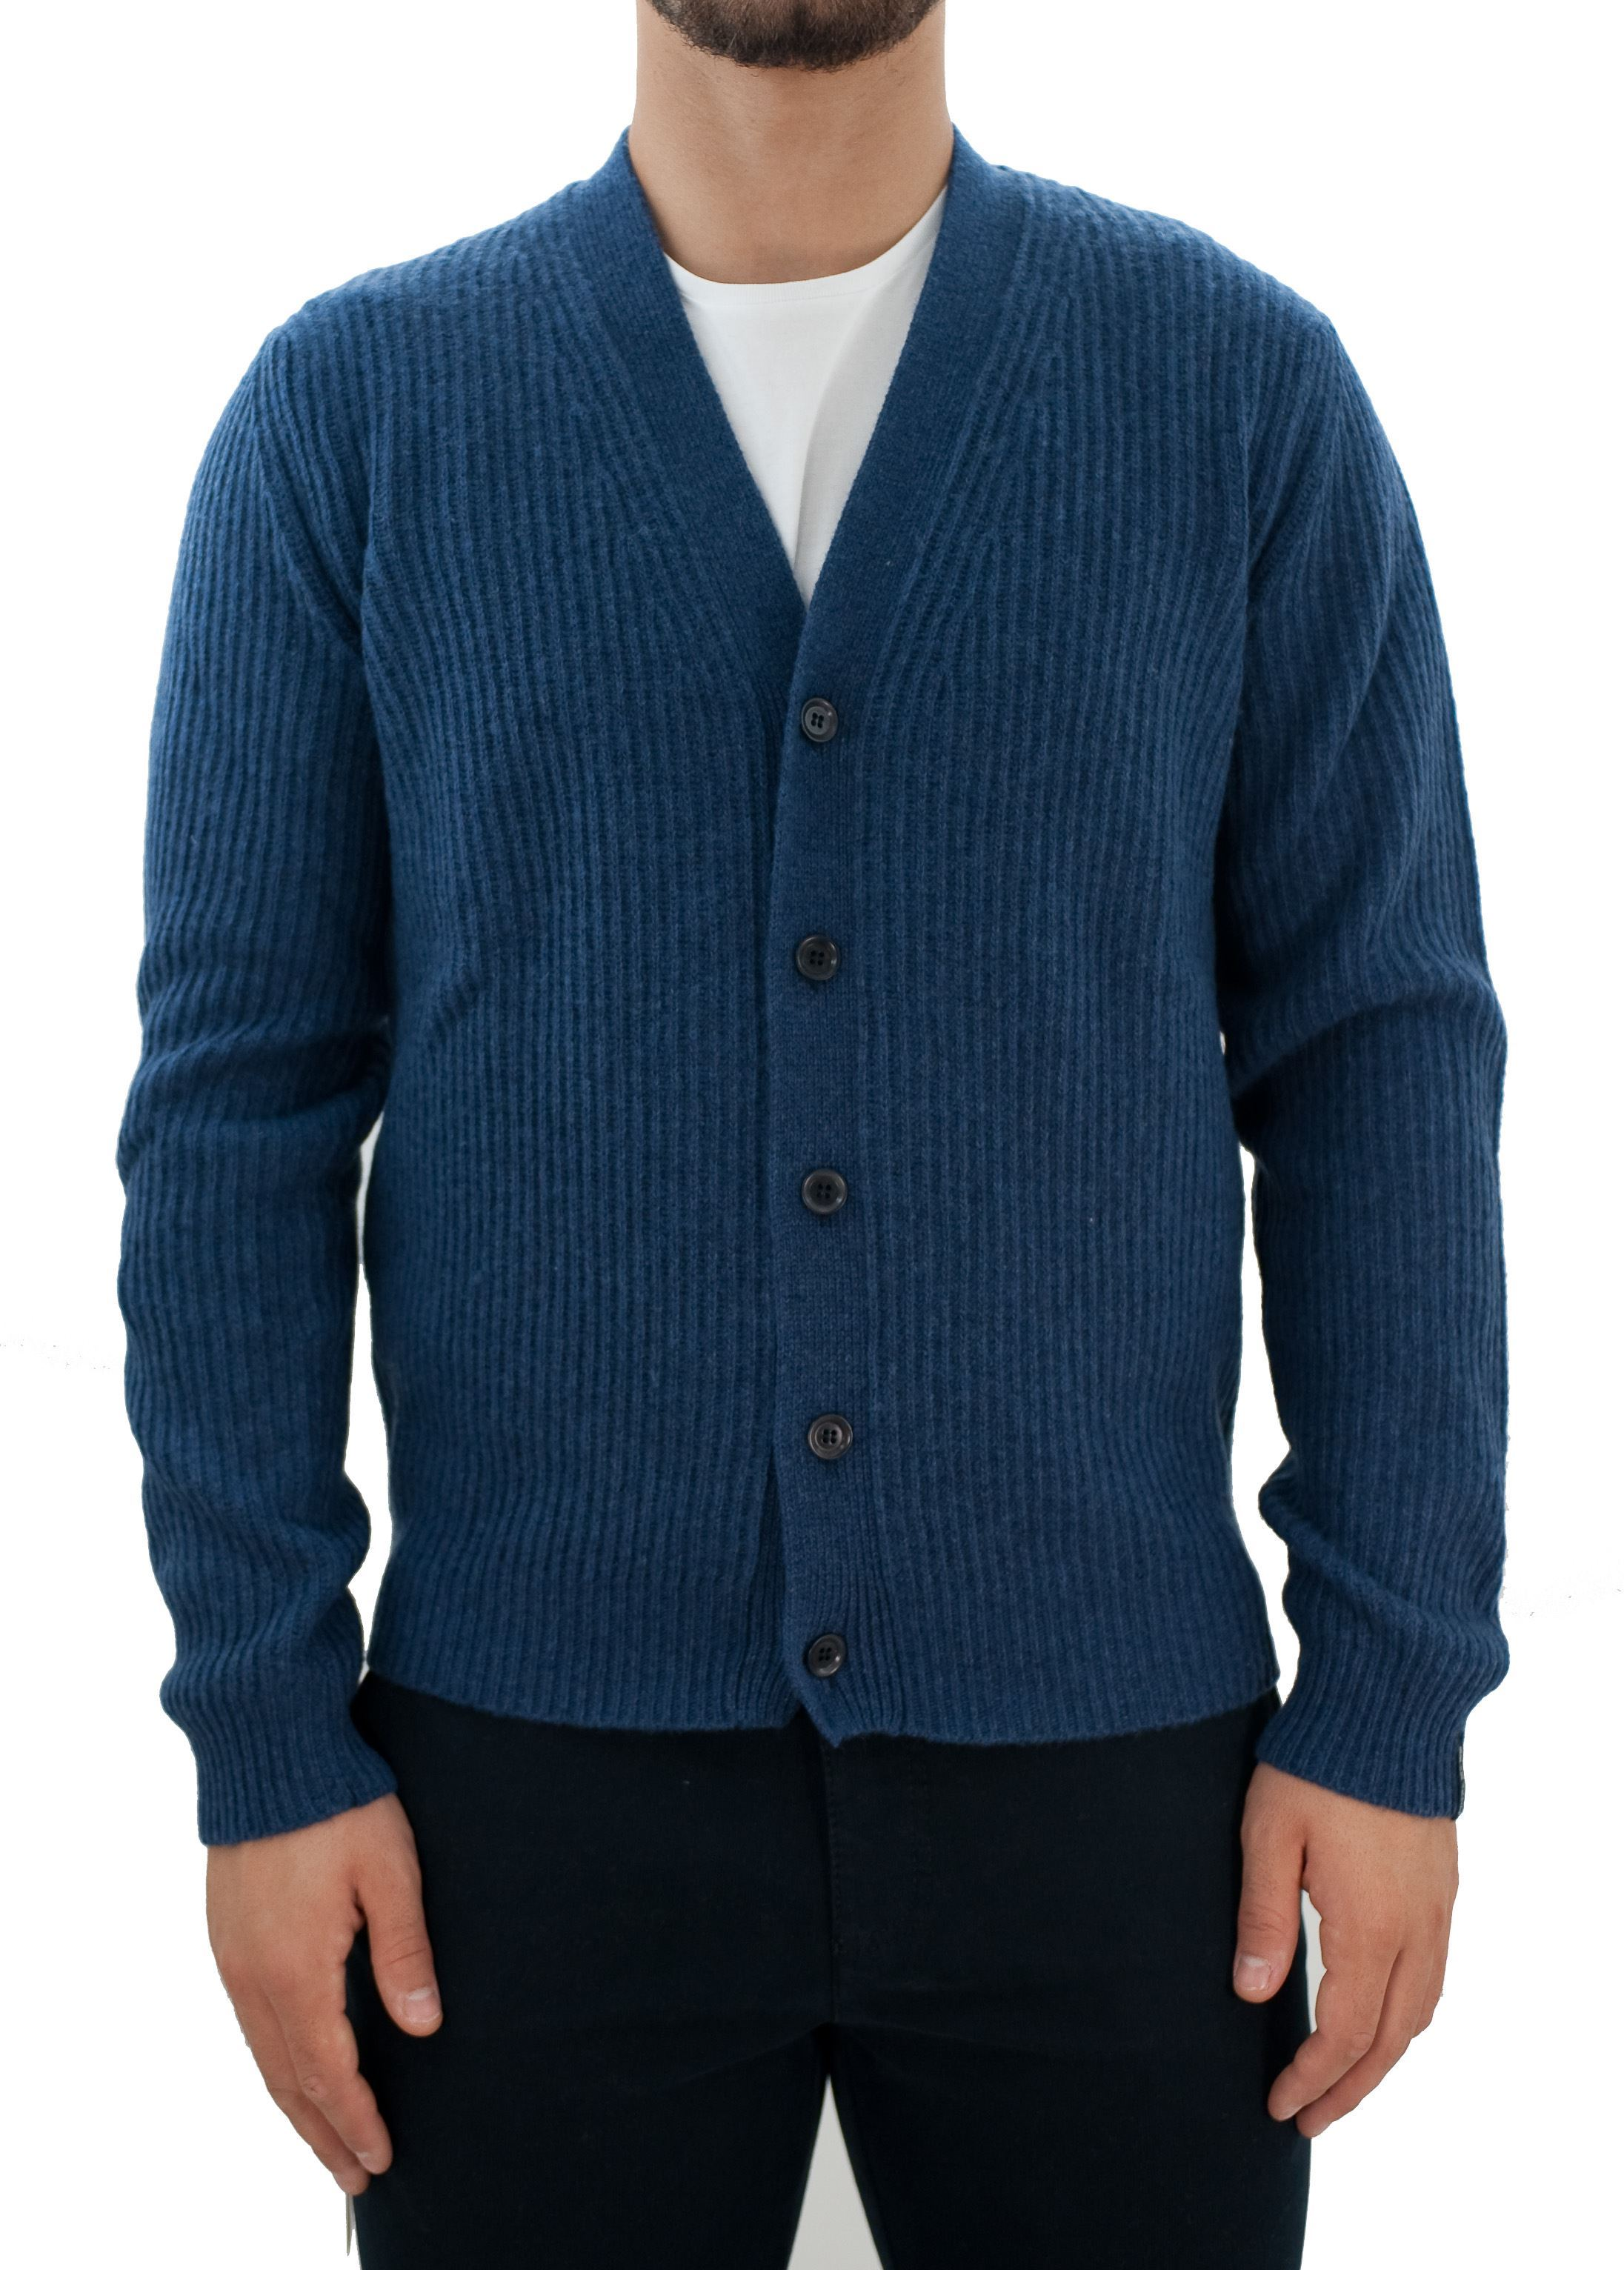 Picture of Giacca a maglia di lana